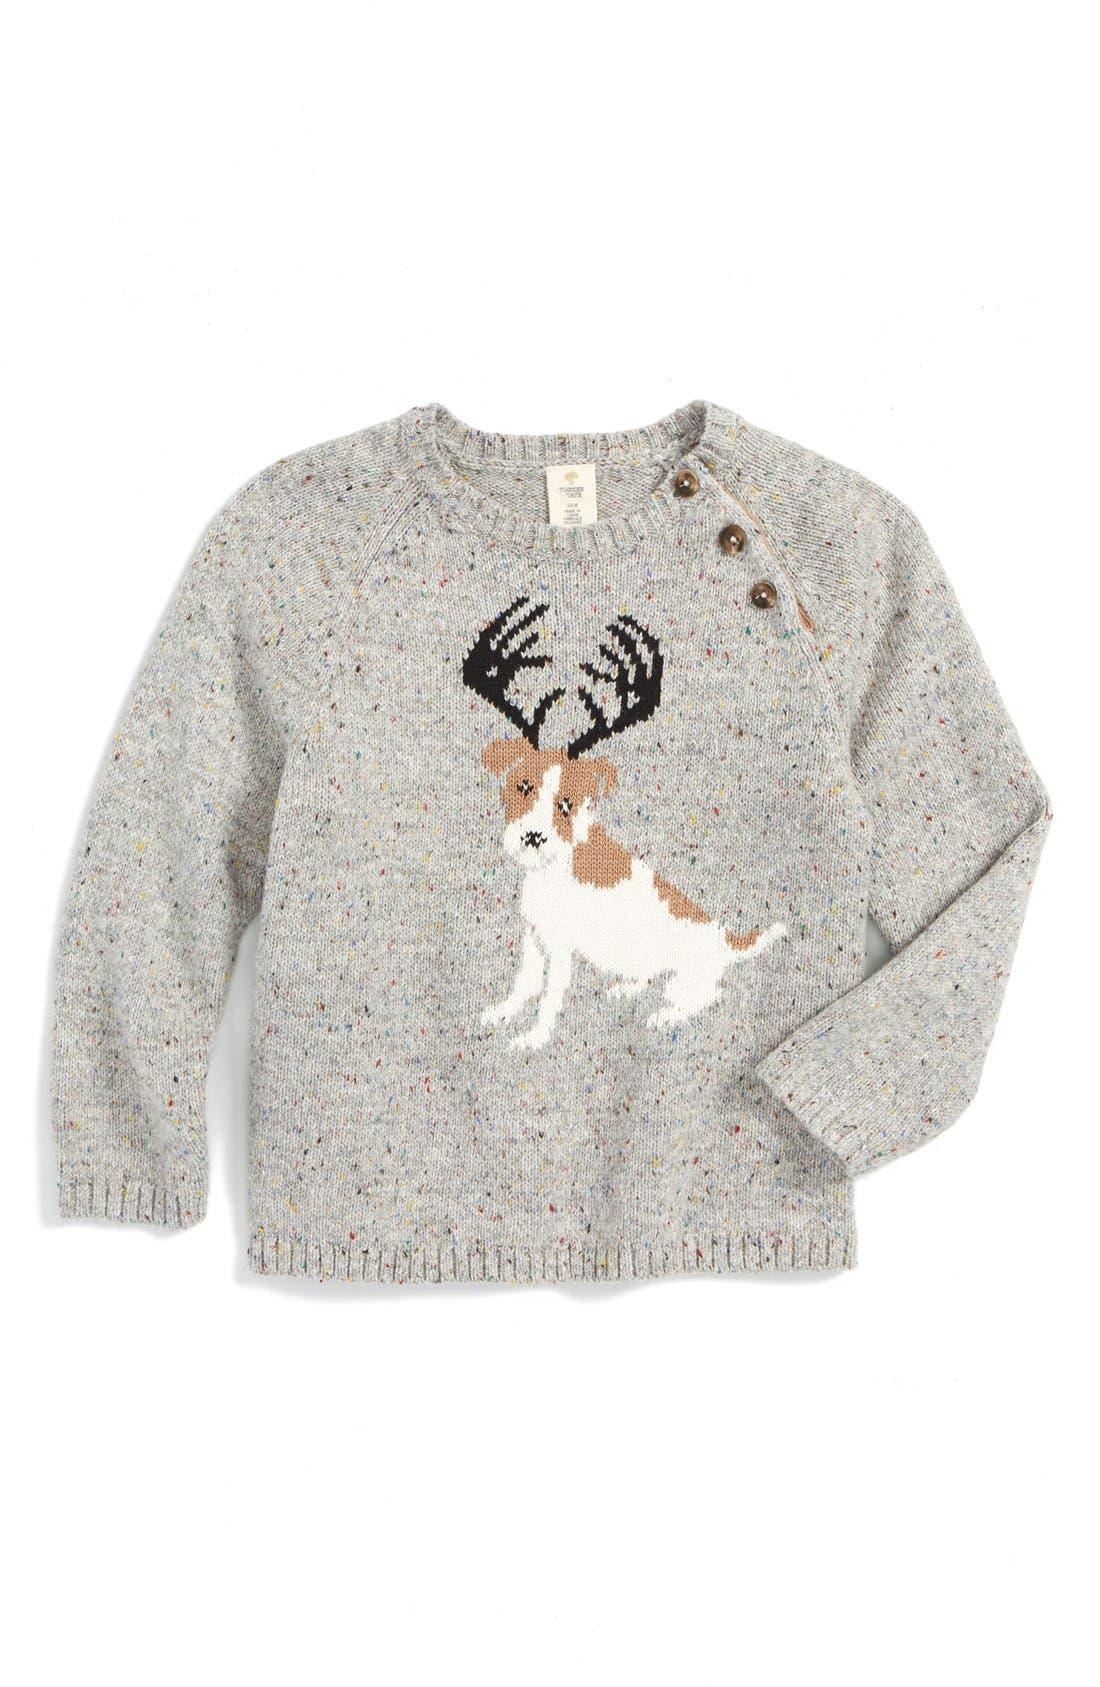 Main Image - Tucker + Tate 'Reindeer Dog' Intarsia Knit Sweater (Baby Boys)